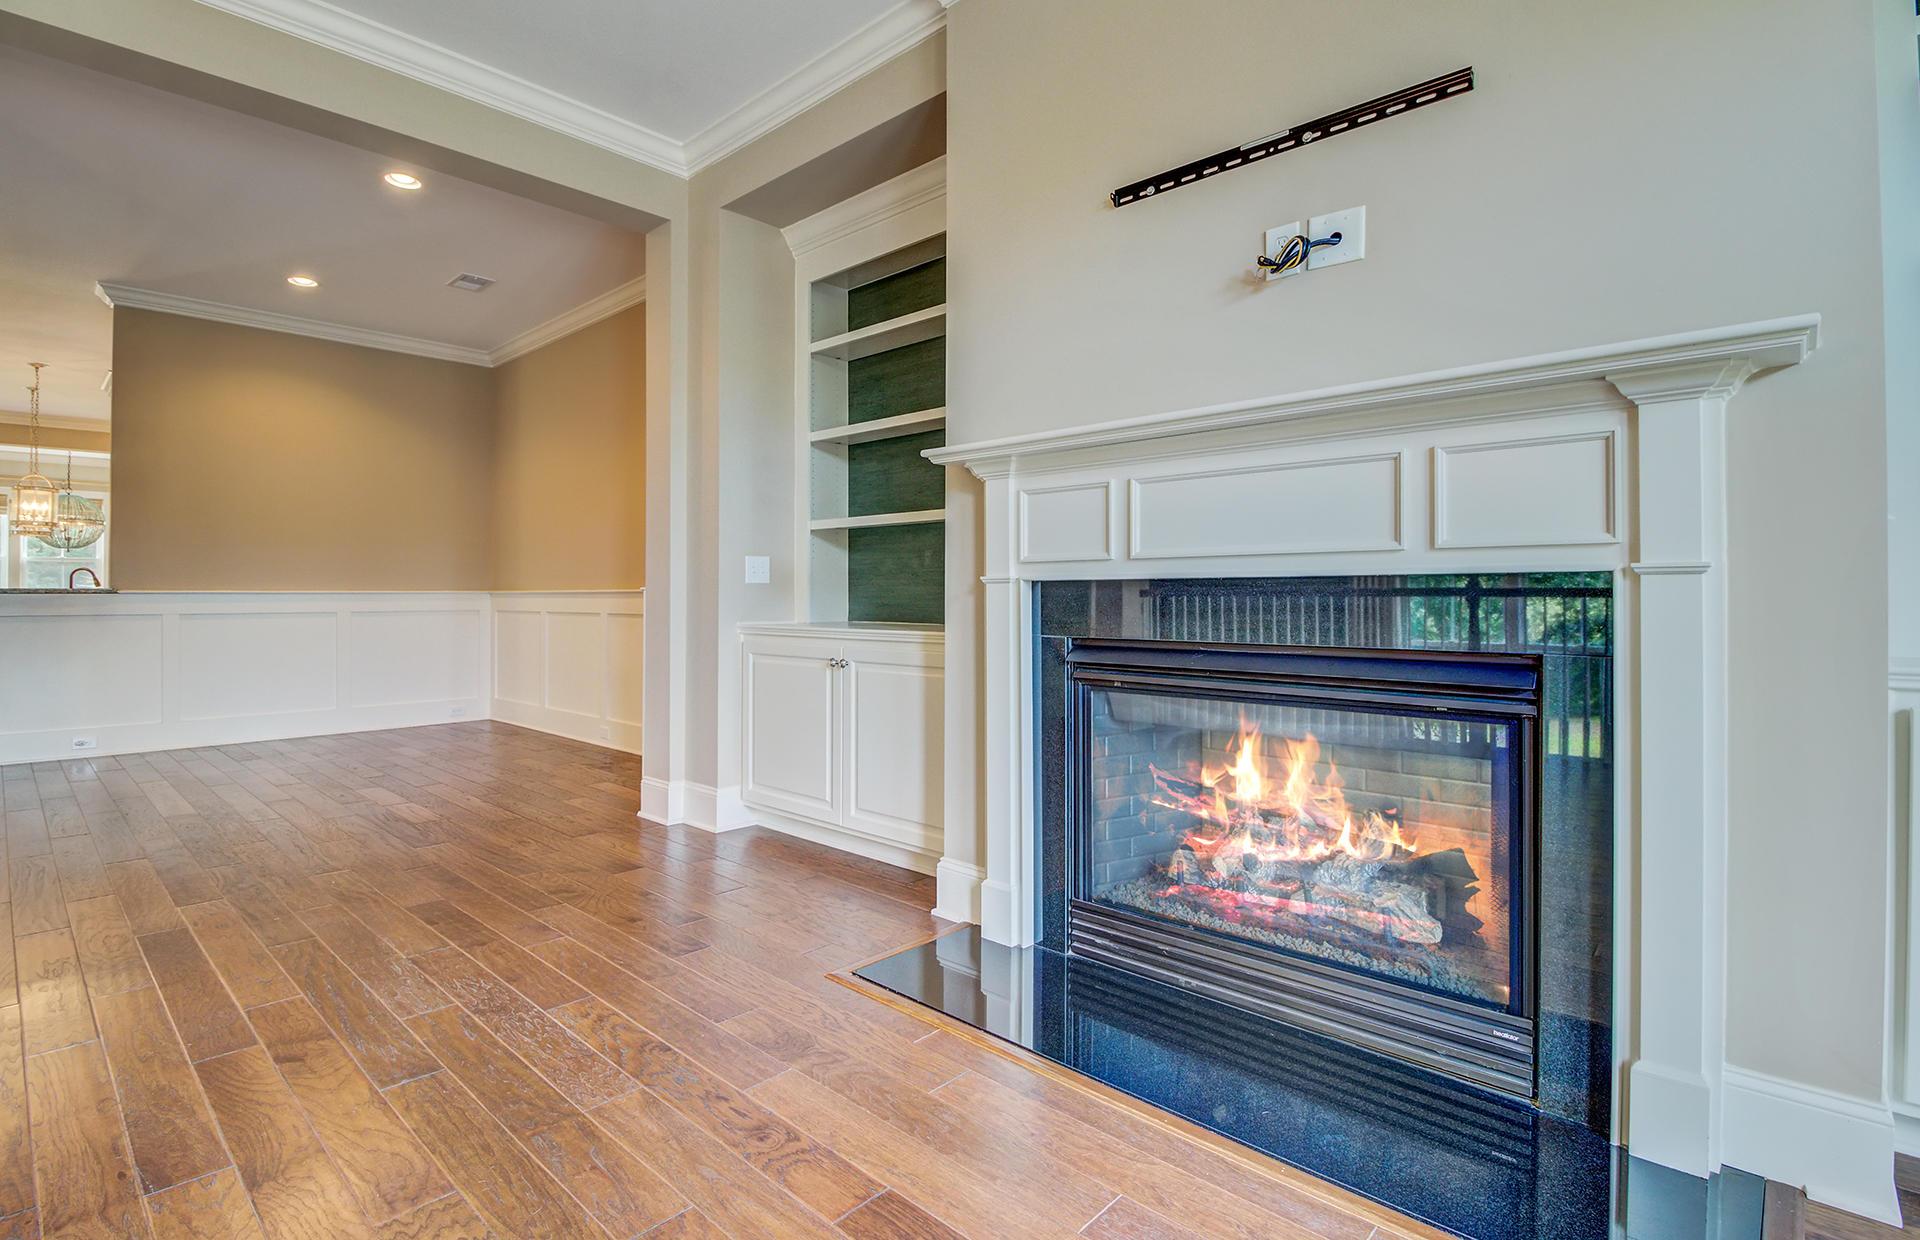 Hamlin Plantation Homes For Sale - 3093 Monhegan, Mount Pleasant, SC - 0